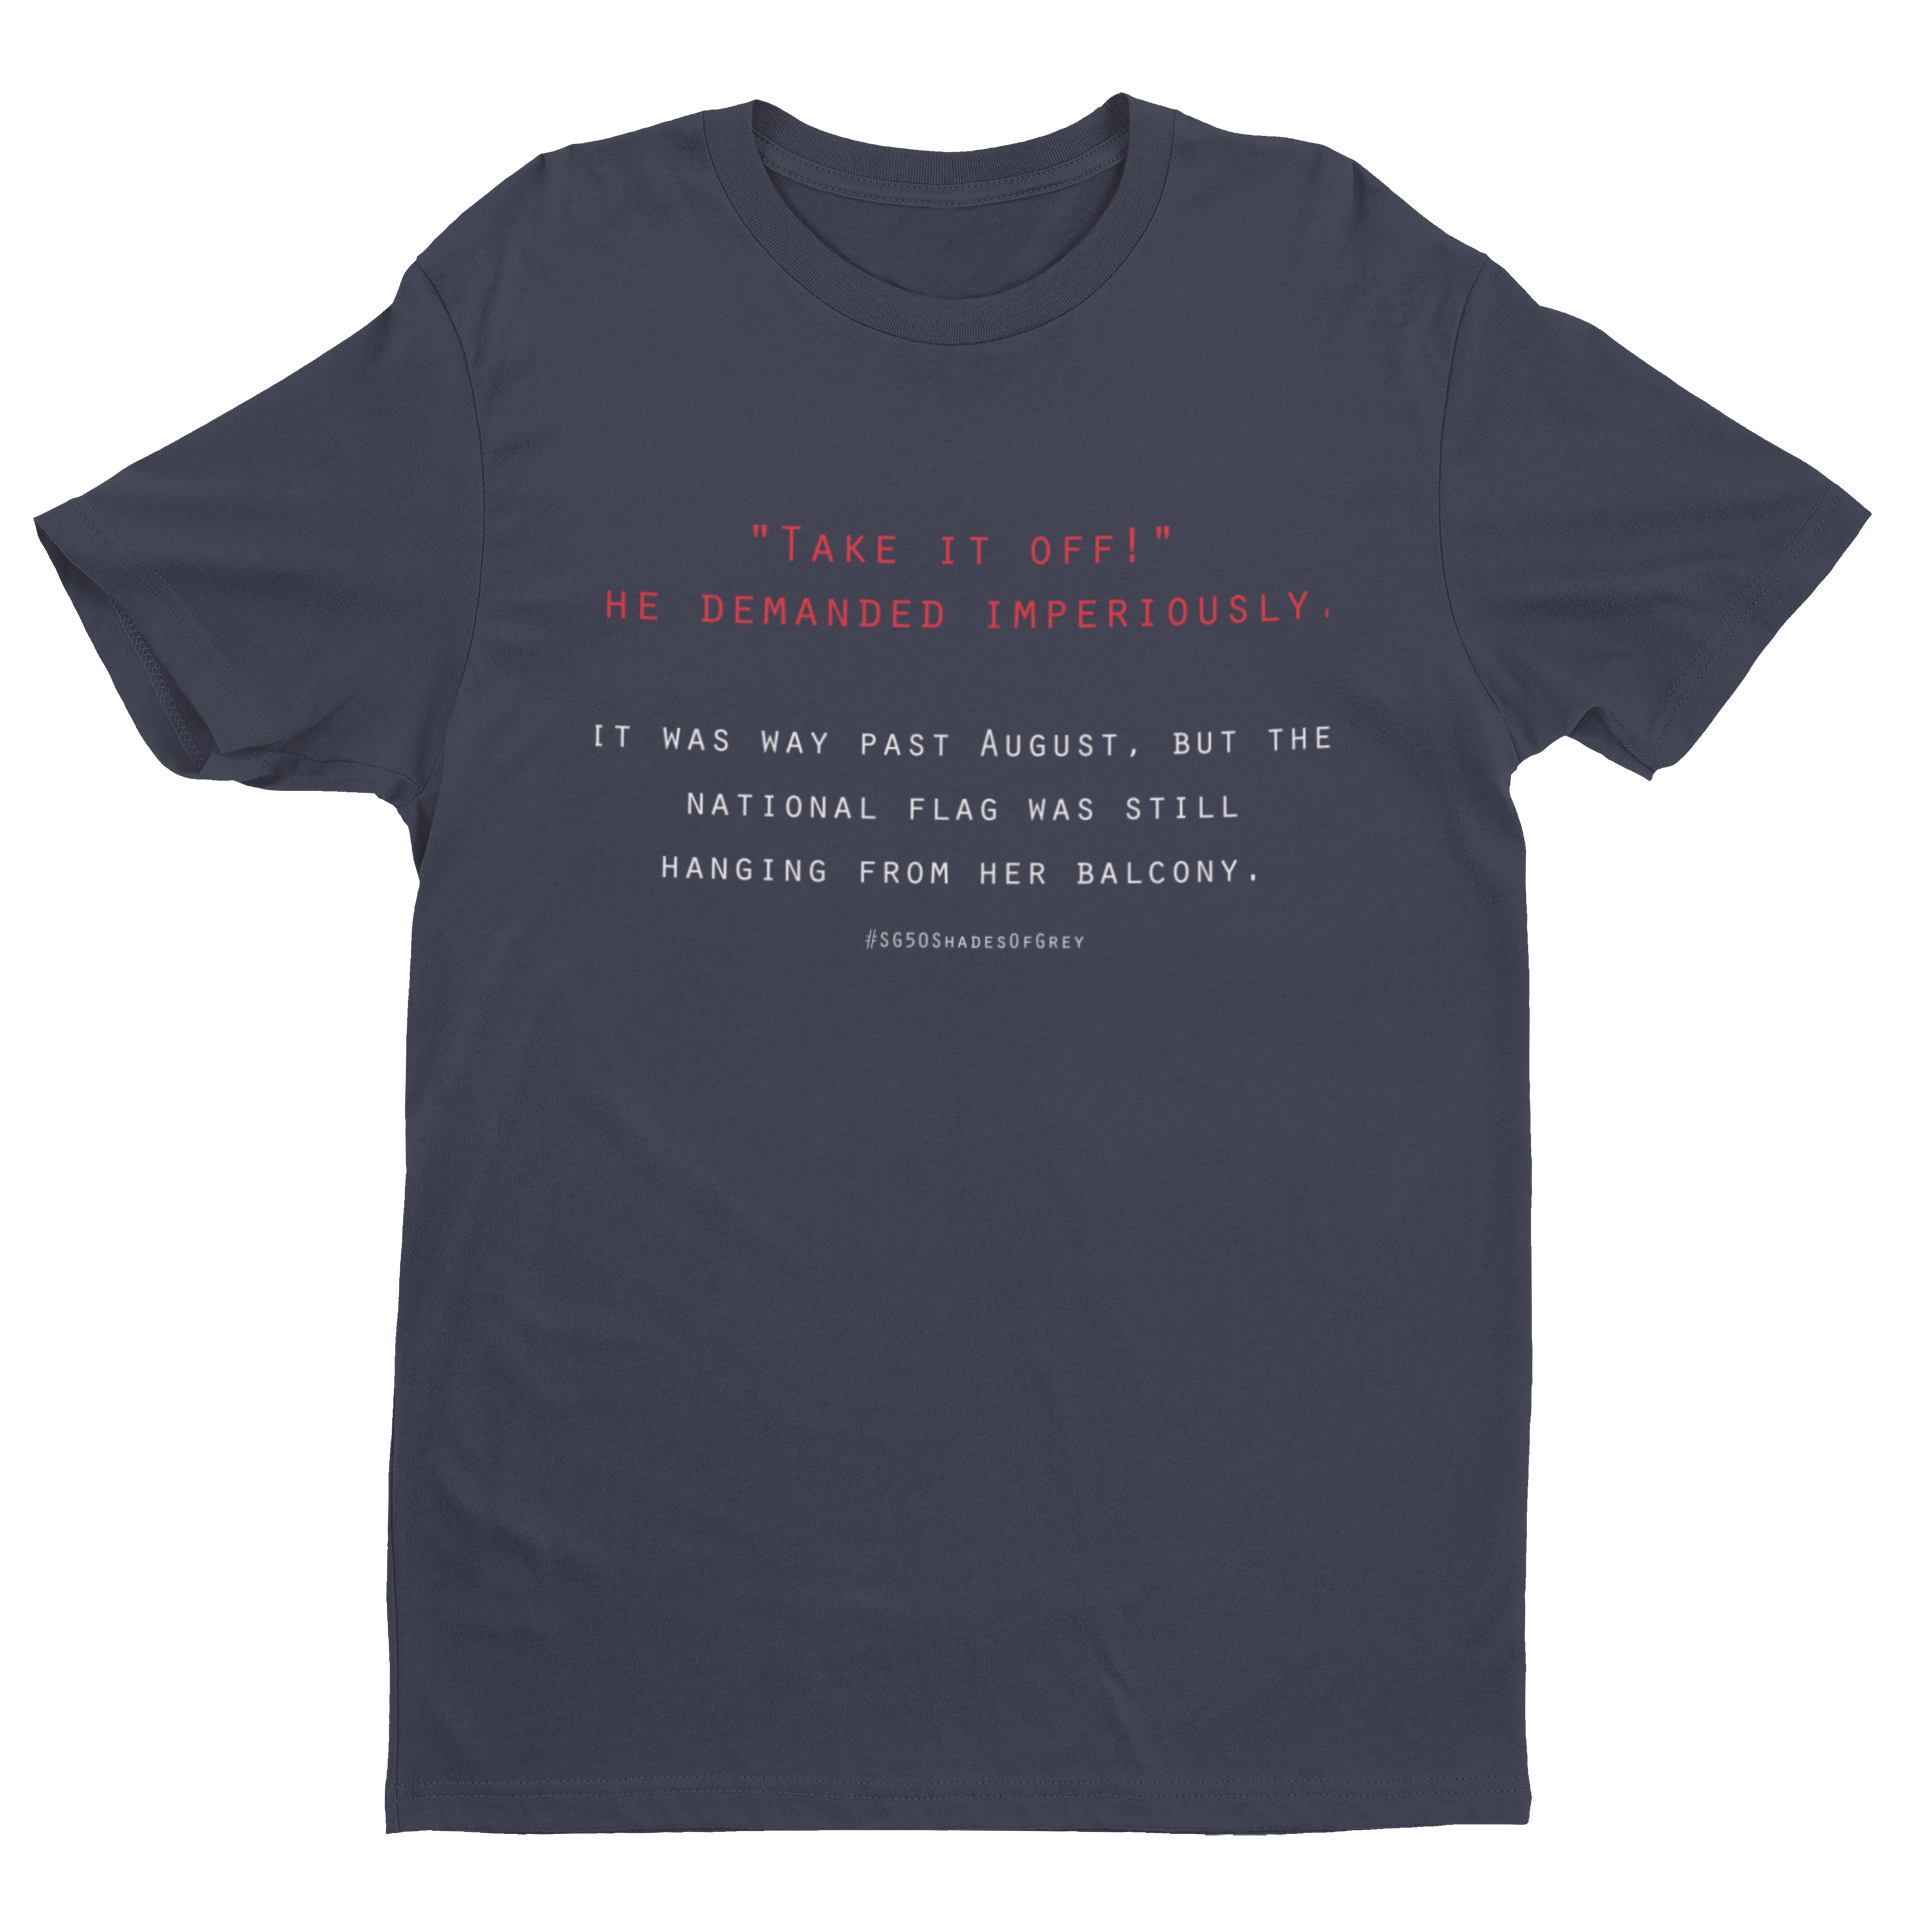 SG50 Shades of Grey - Flag Crew Neck S-Sleeve T-shirt